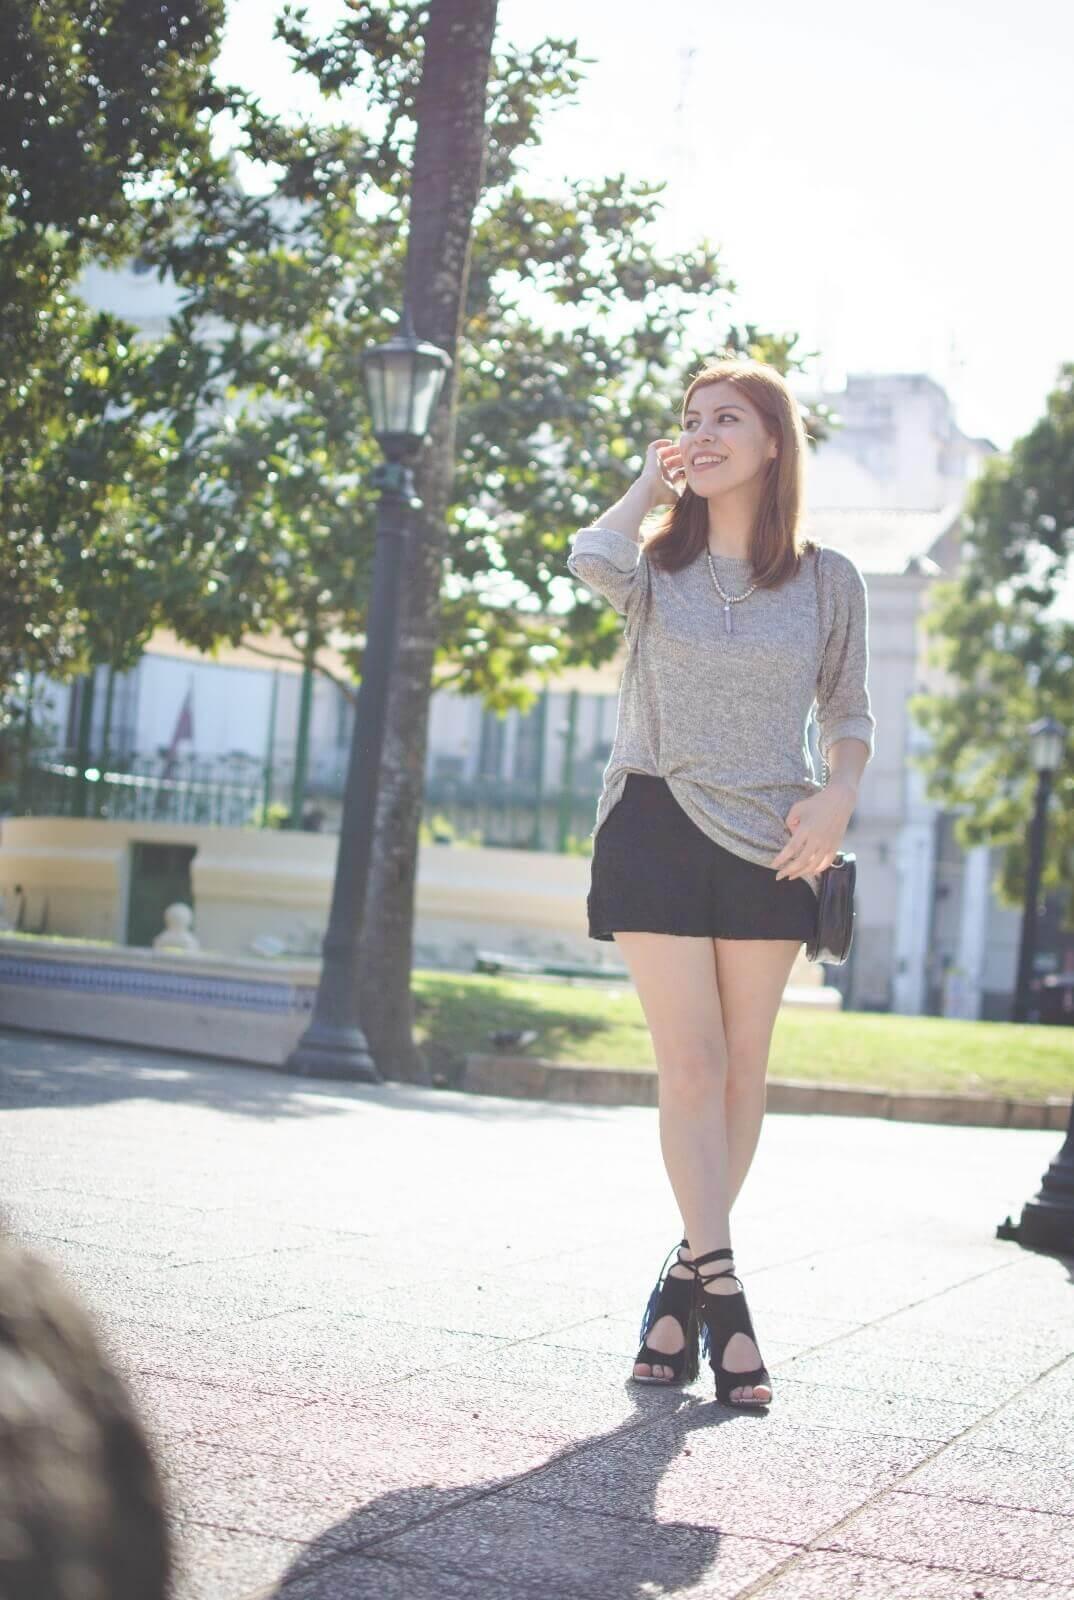 zaful-statement-shoes-silver-mirrored-sunglasses-deborah-ferrero-streetstyle-style-by-deb08